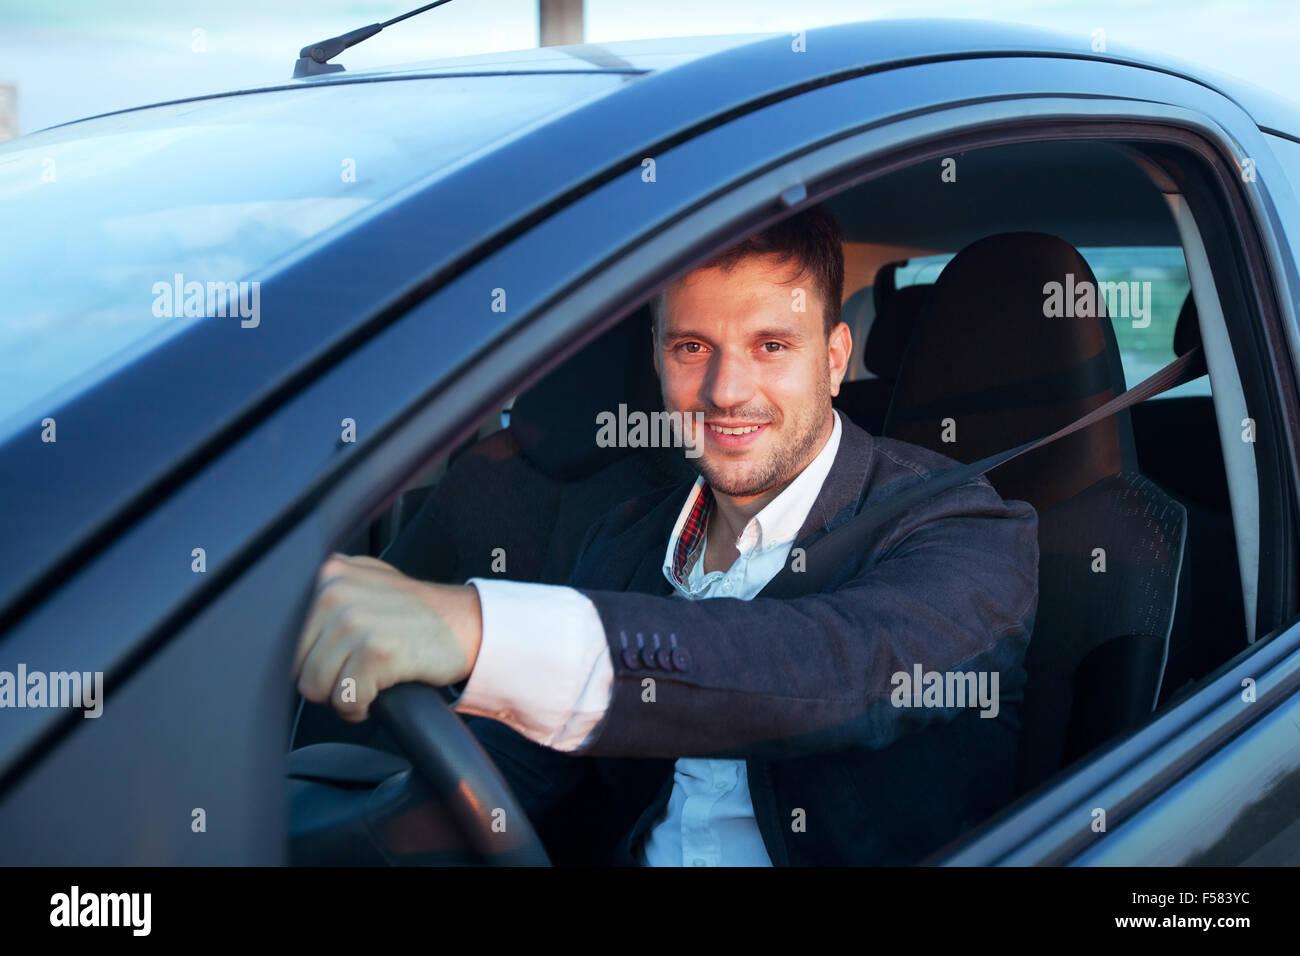 Louer une voiture, smiling happy caucasian man driving Photo Stock